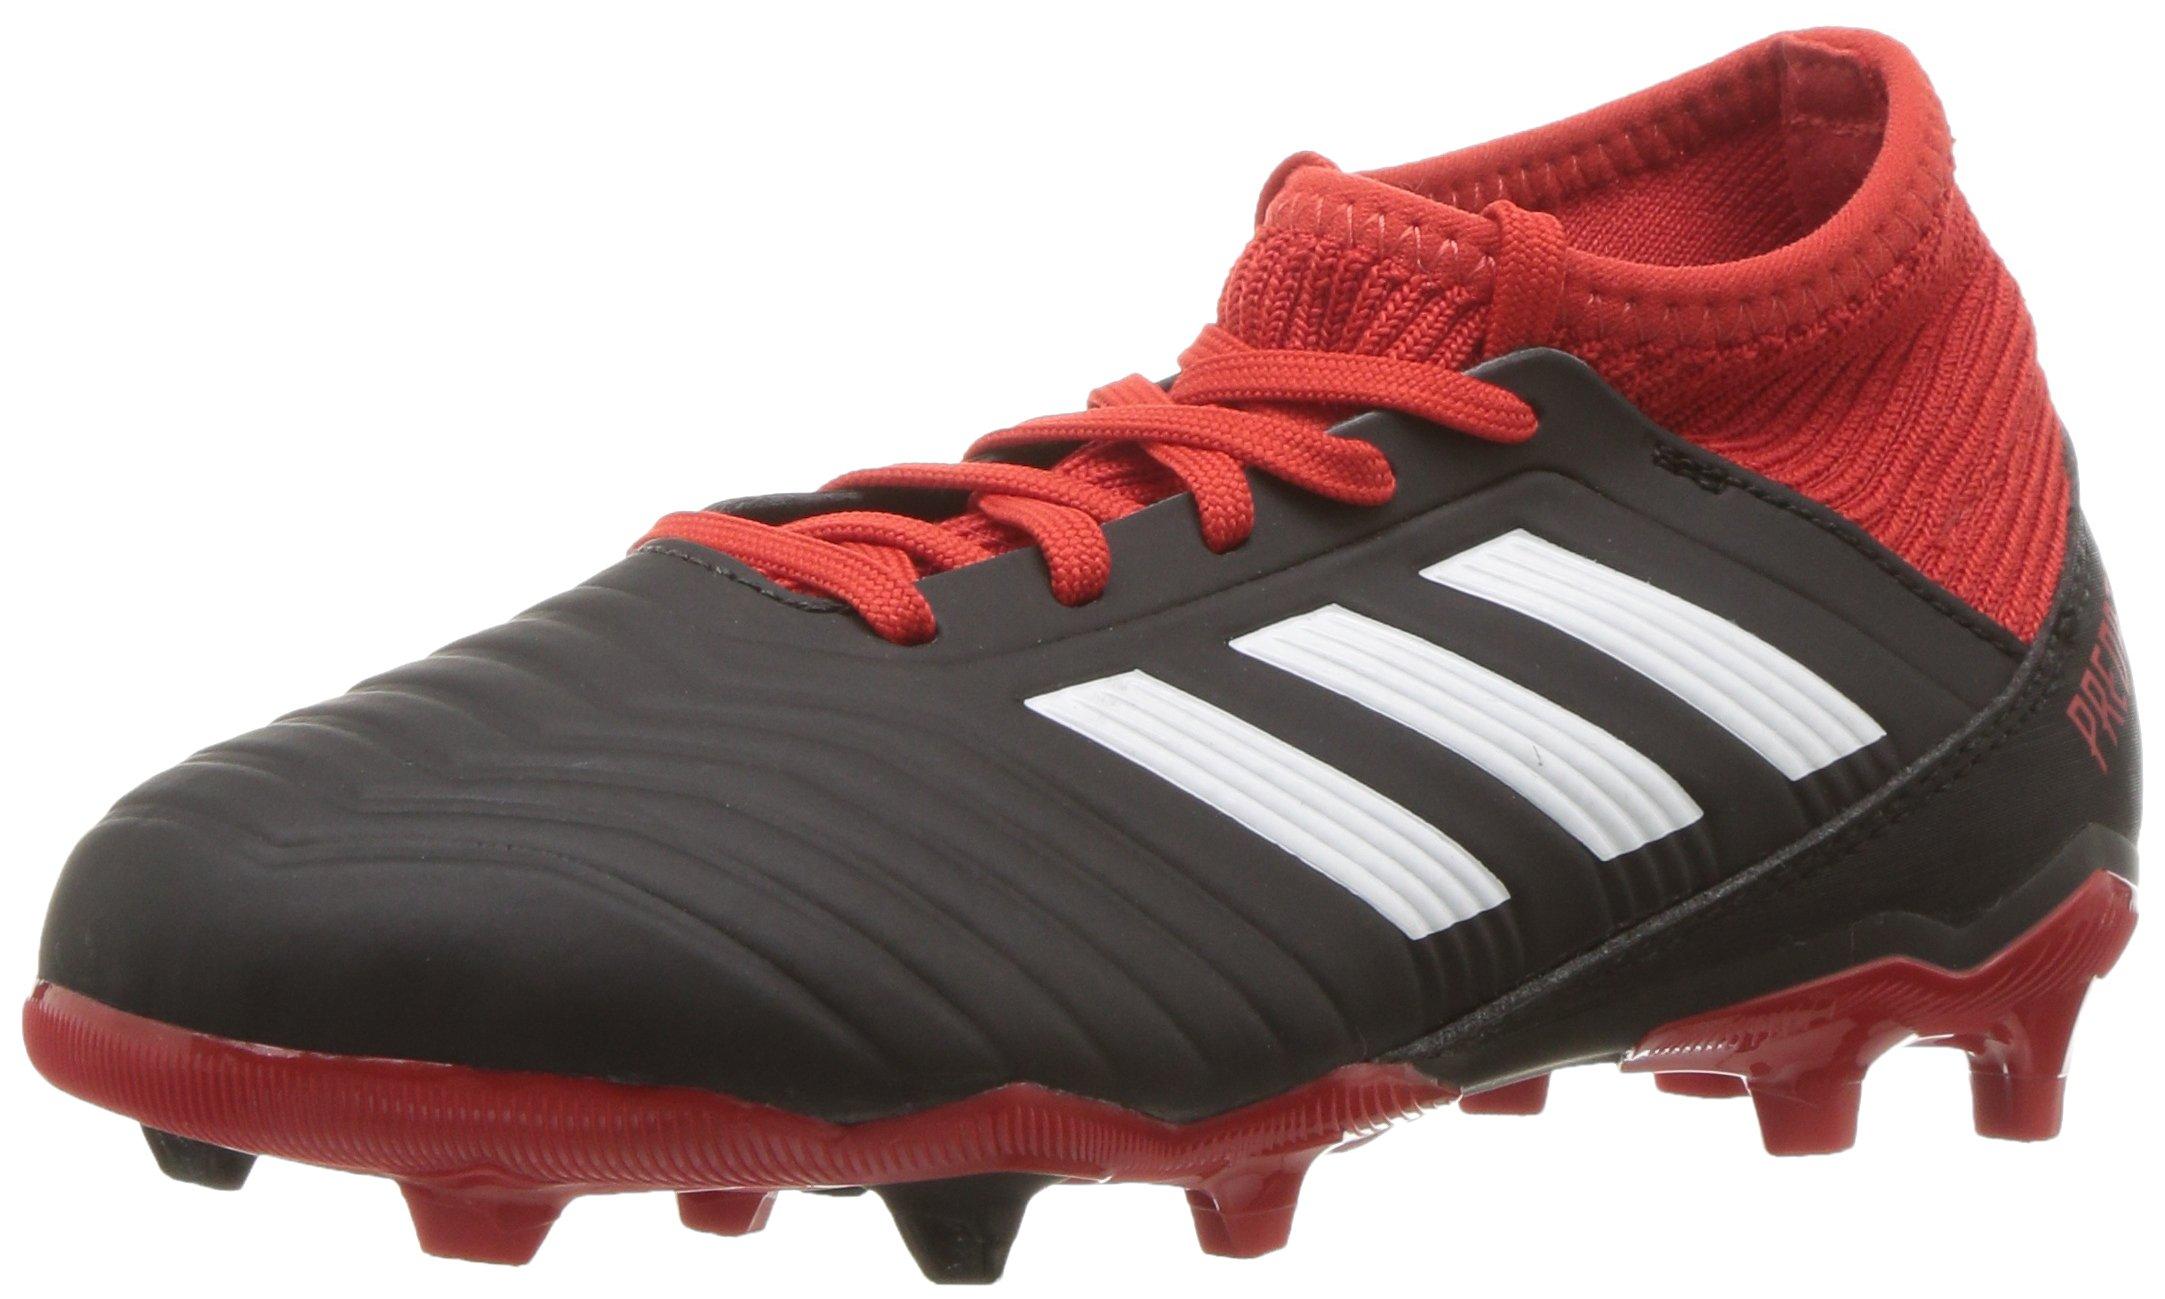 adidas Unisex Predator 18.3 Firm Ground Soccer Shoe, Black/White/red, 5.5 M US Big Kid